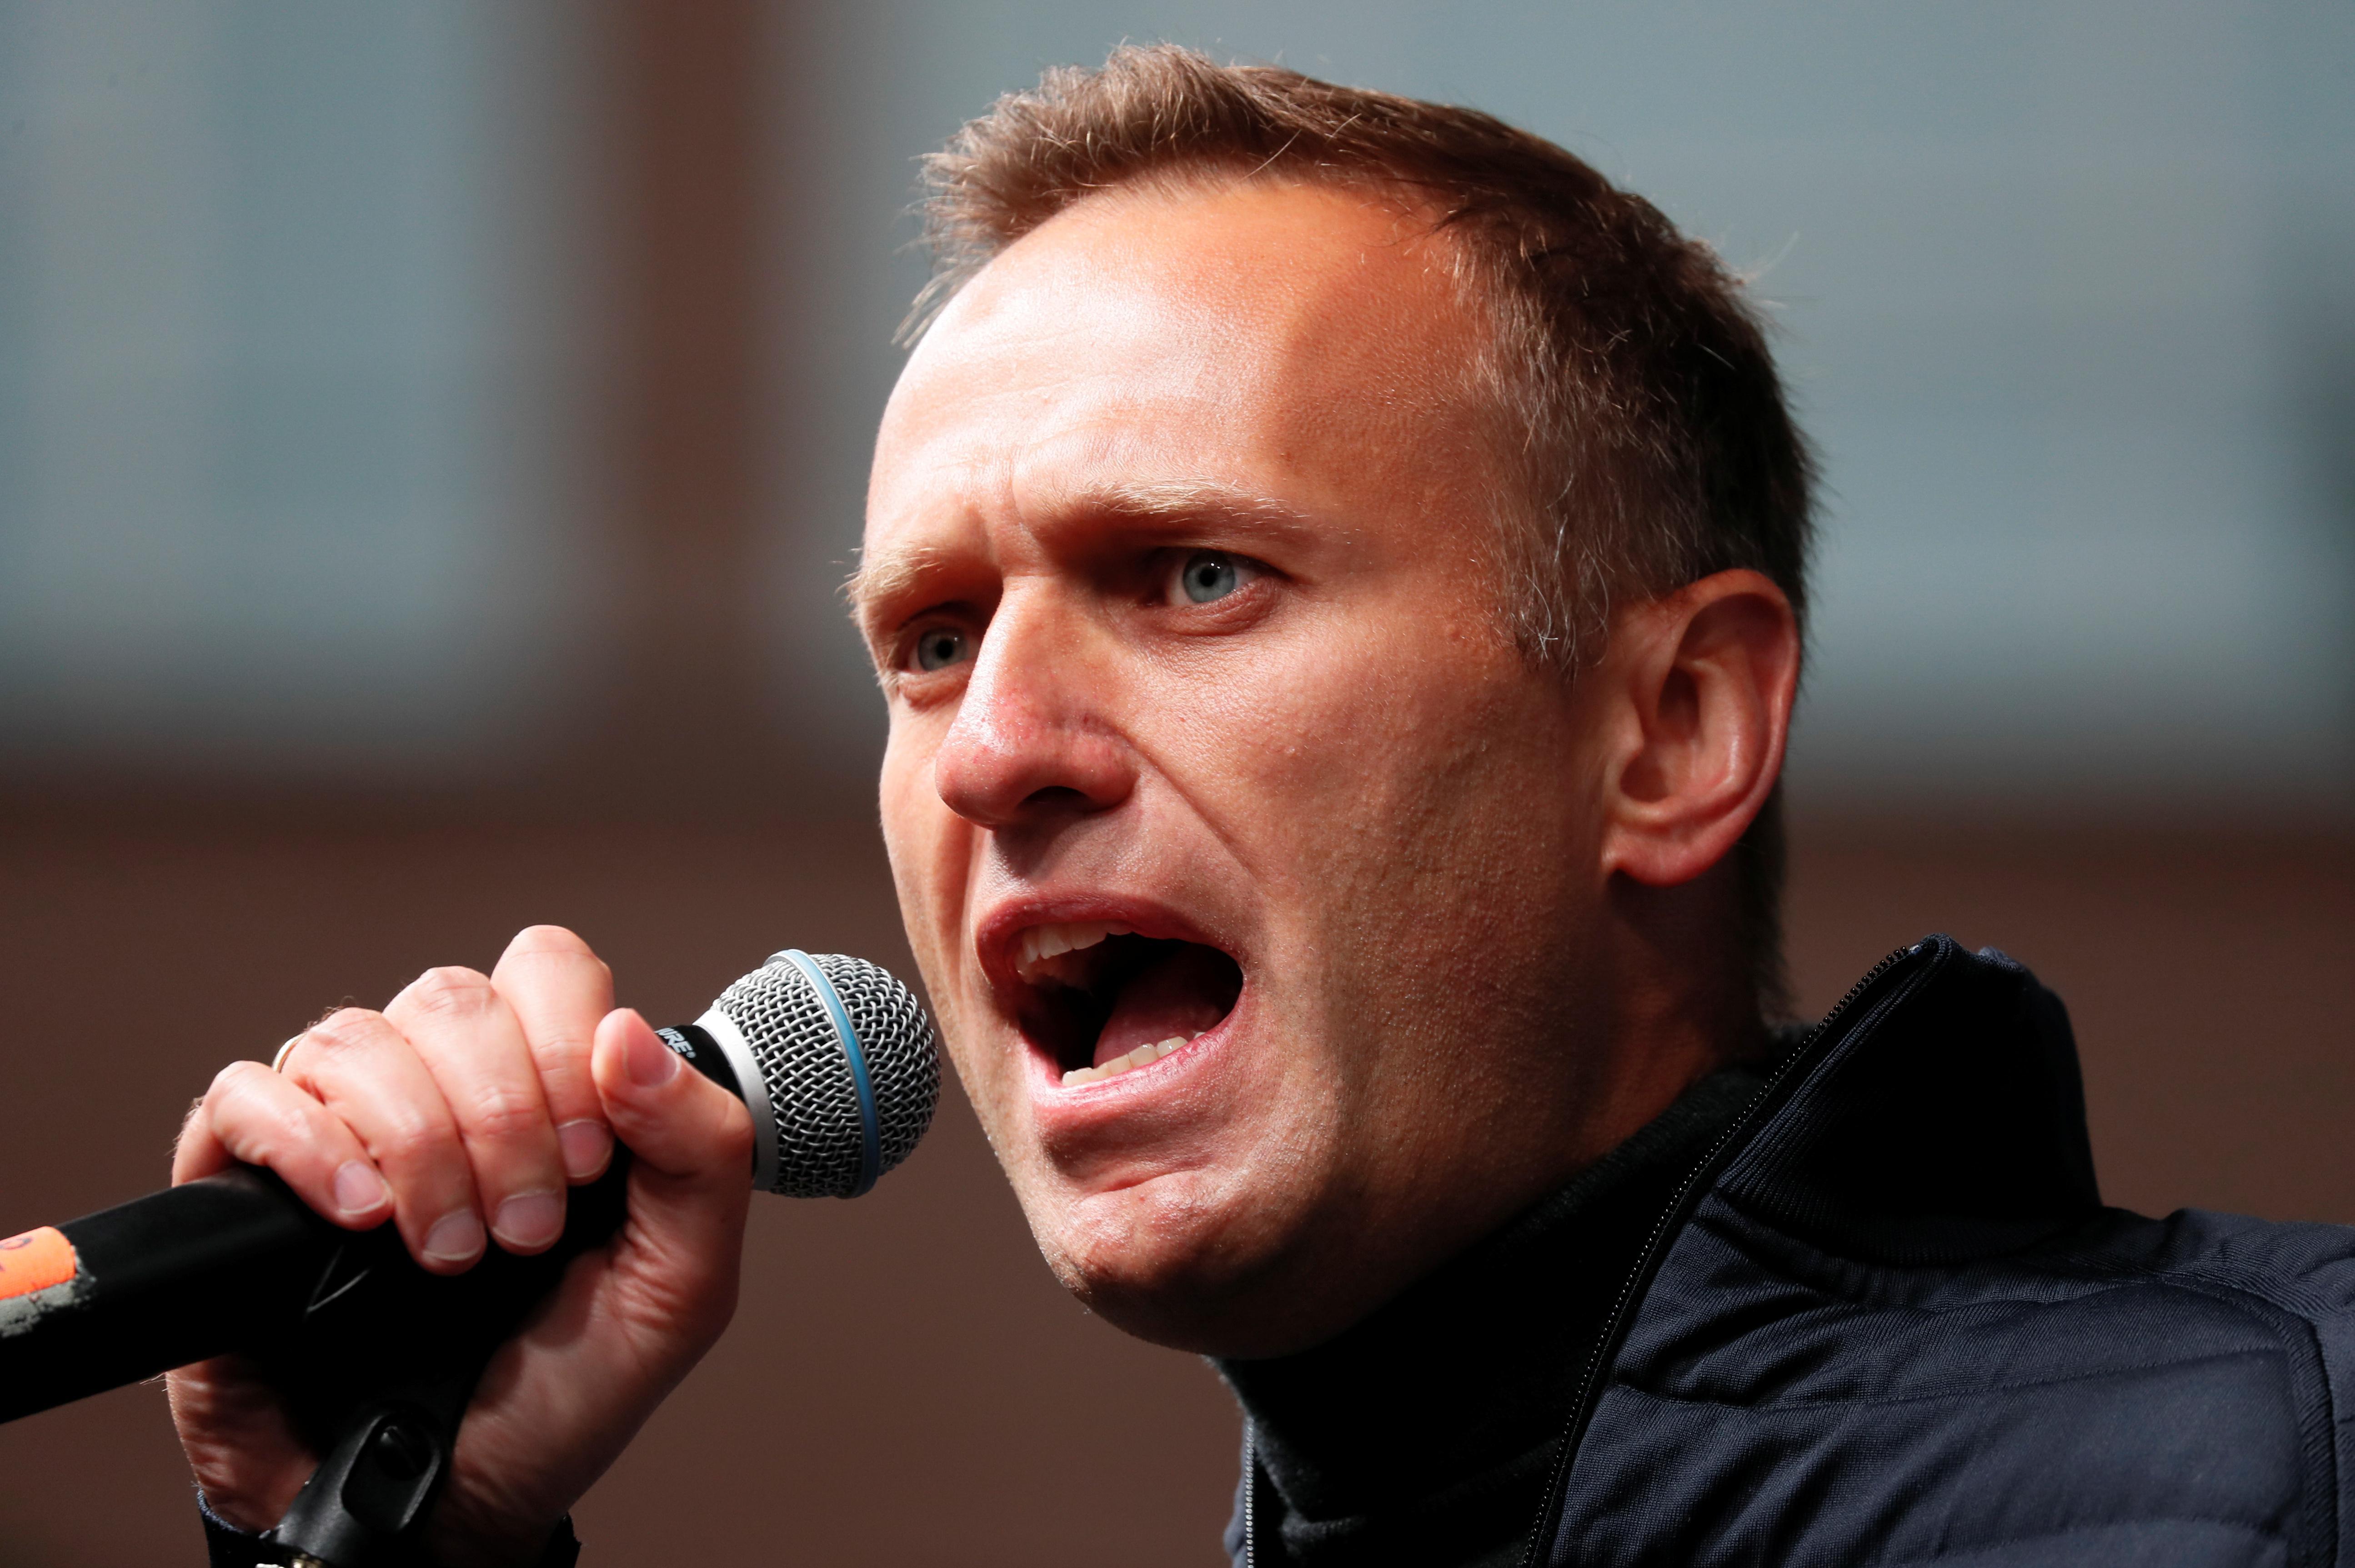 Kremlin critic Navalny says prosecutors want to seize his home